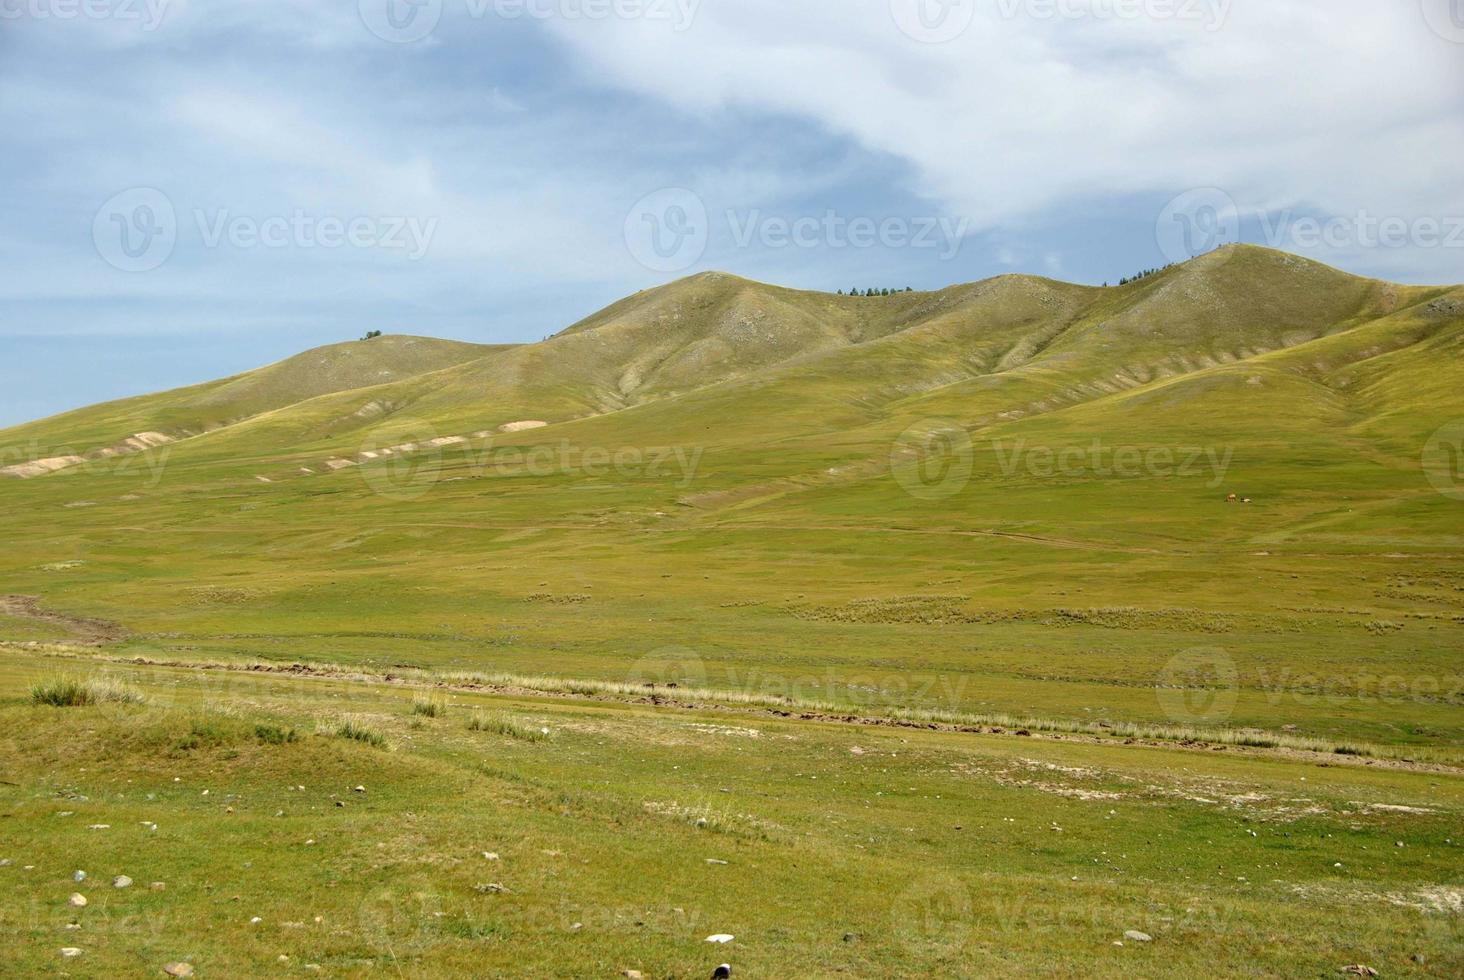 Landscape in Mongolia photo